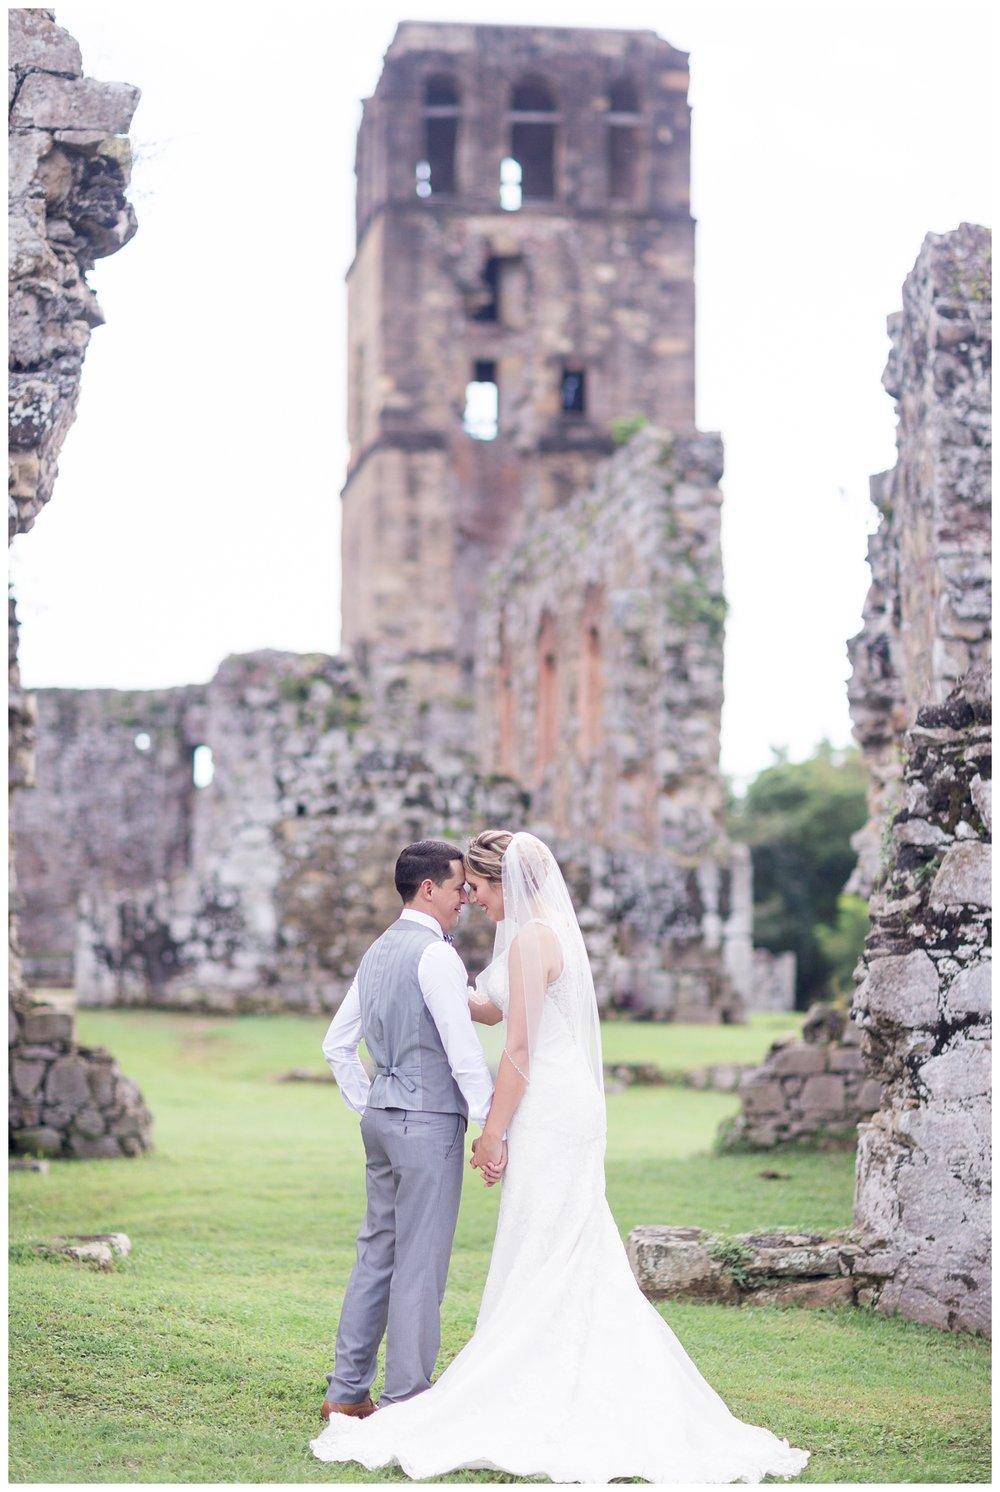 Panama-Destination-Wedding-Photographer_0118-1.jpg